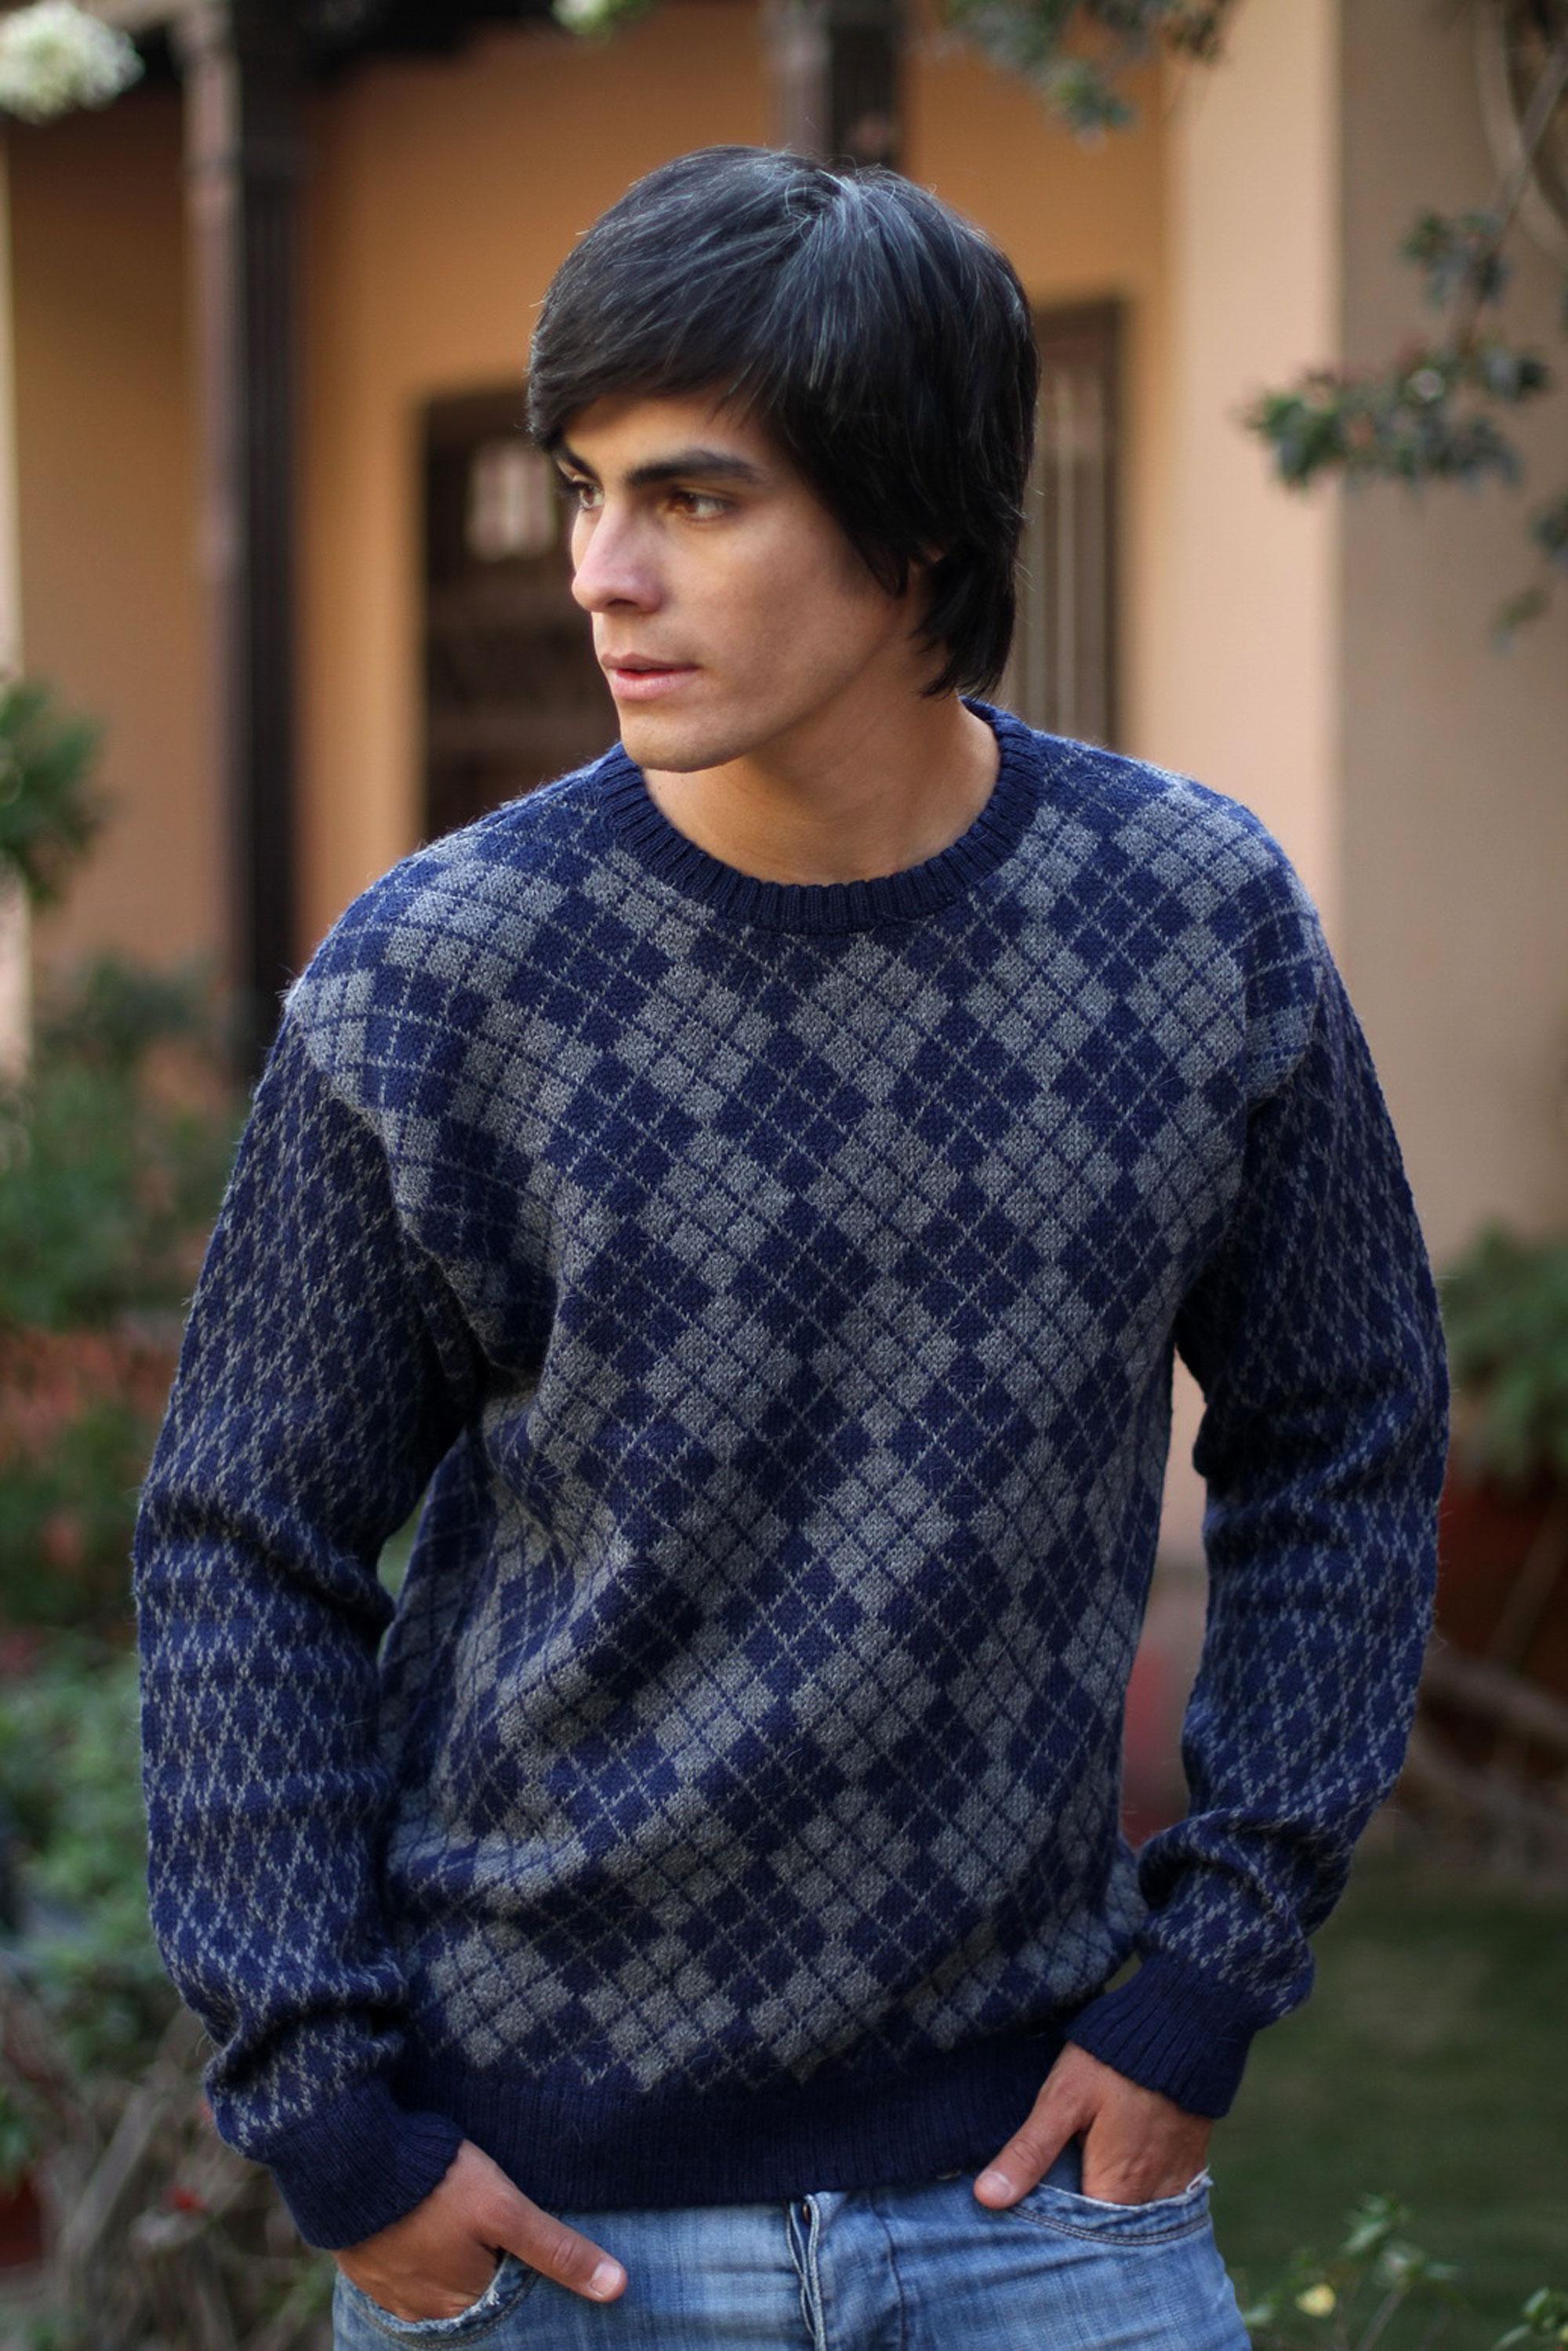 Men's Geometric Alpaca Patterned Pullover Sweater, 'Blue Argyle'